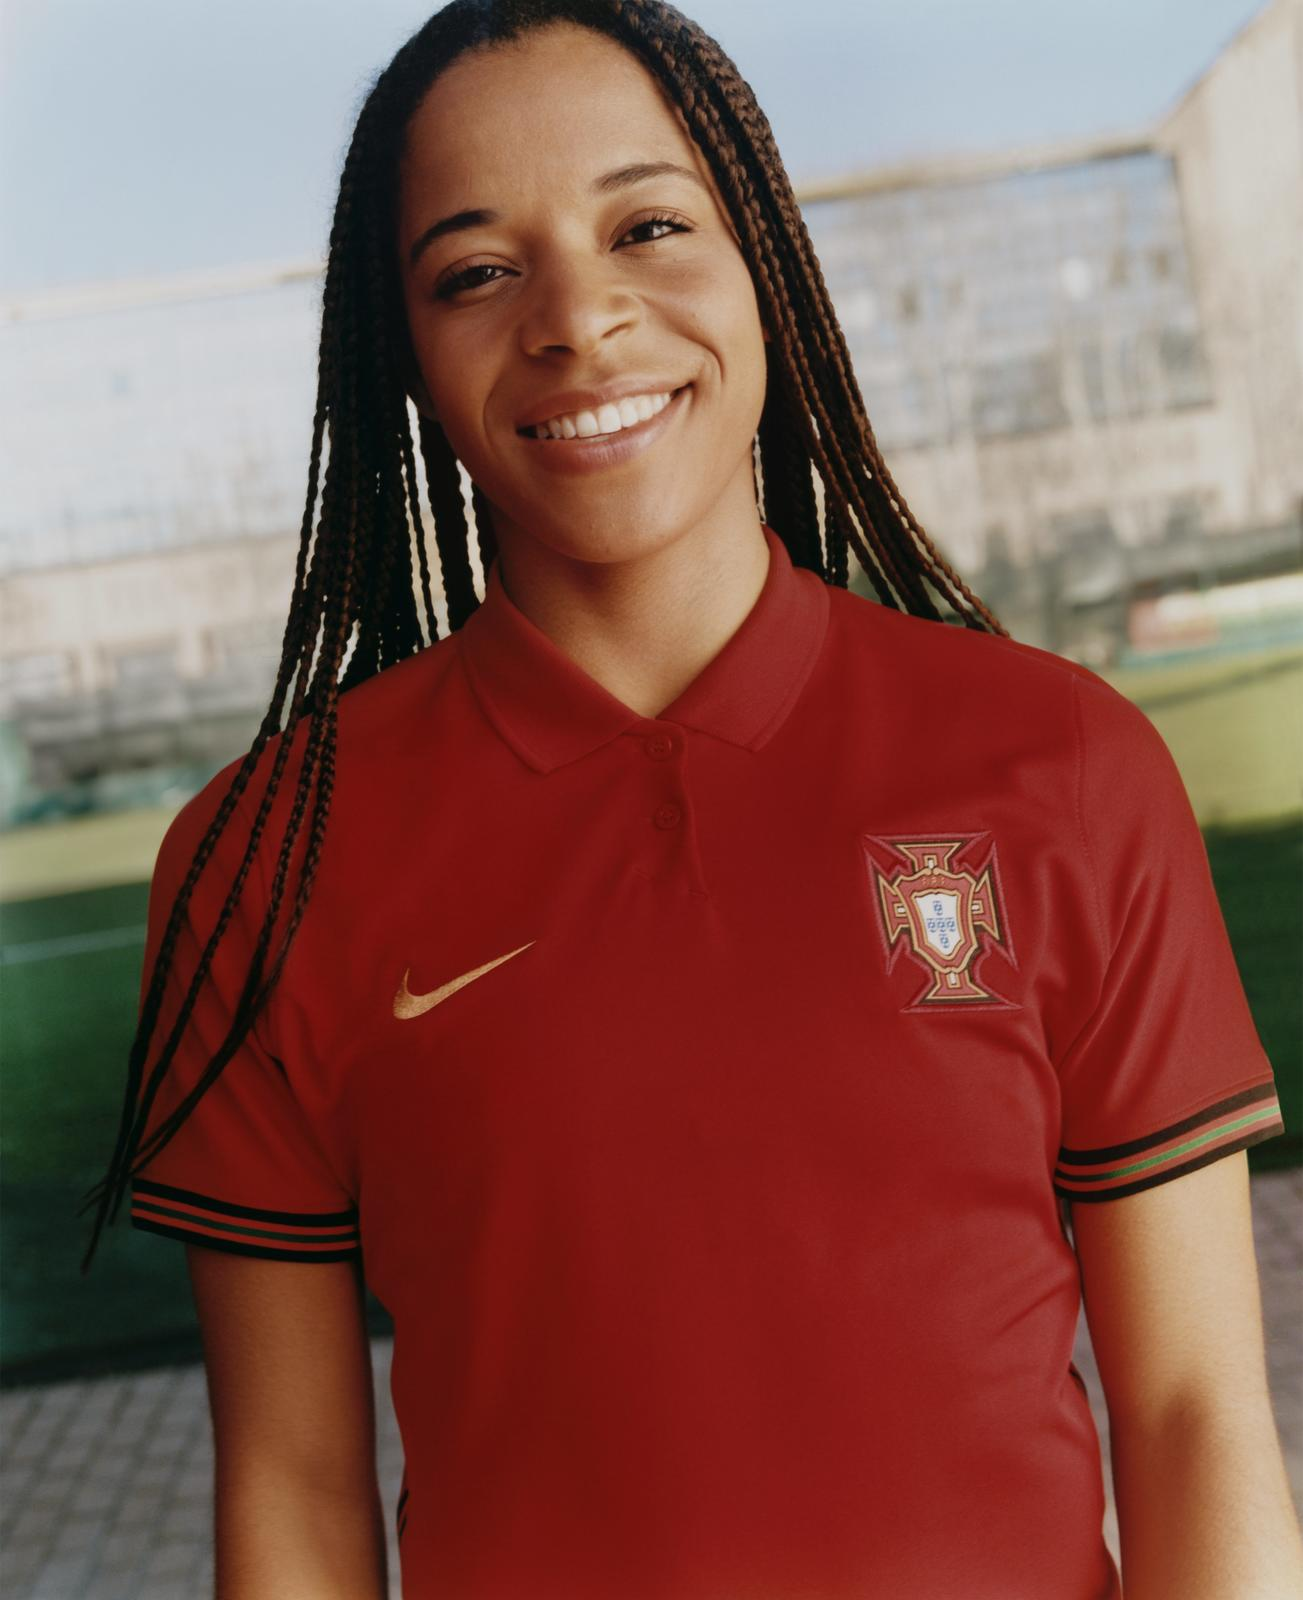 Nike 2020 Portugal National Team Kit 10